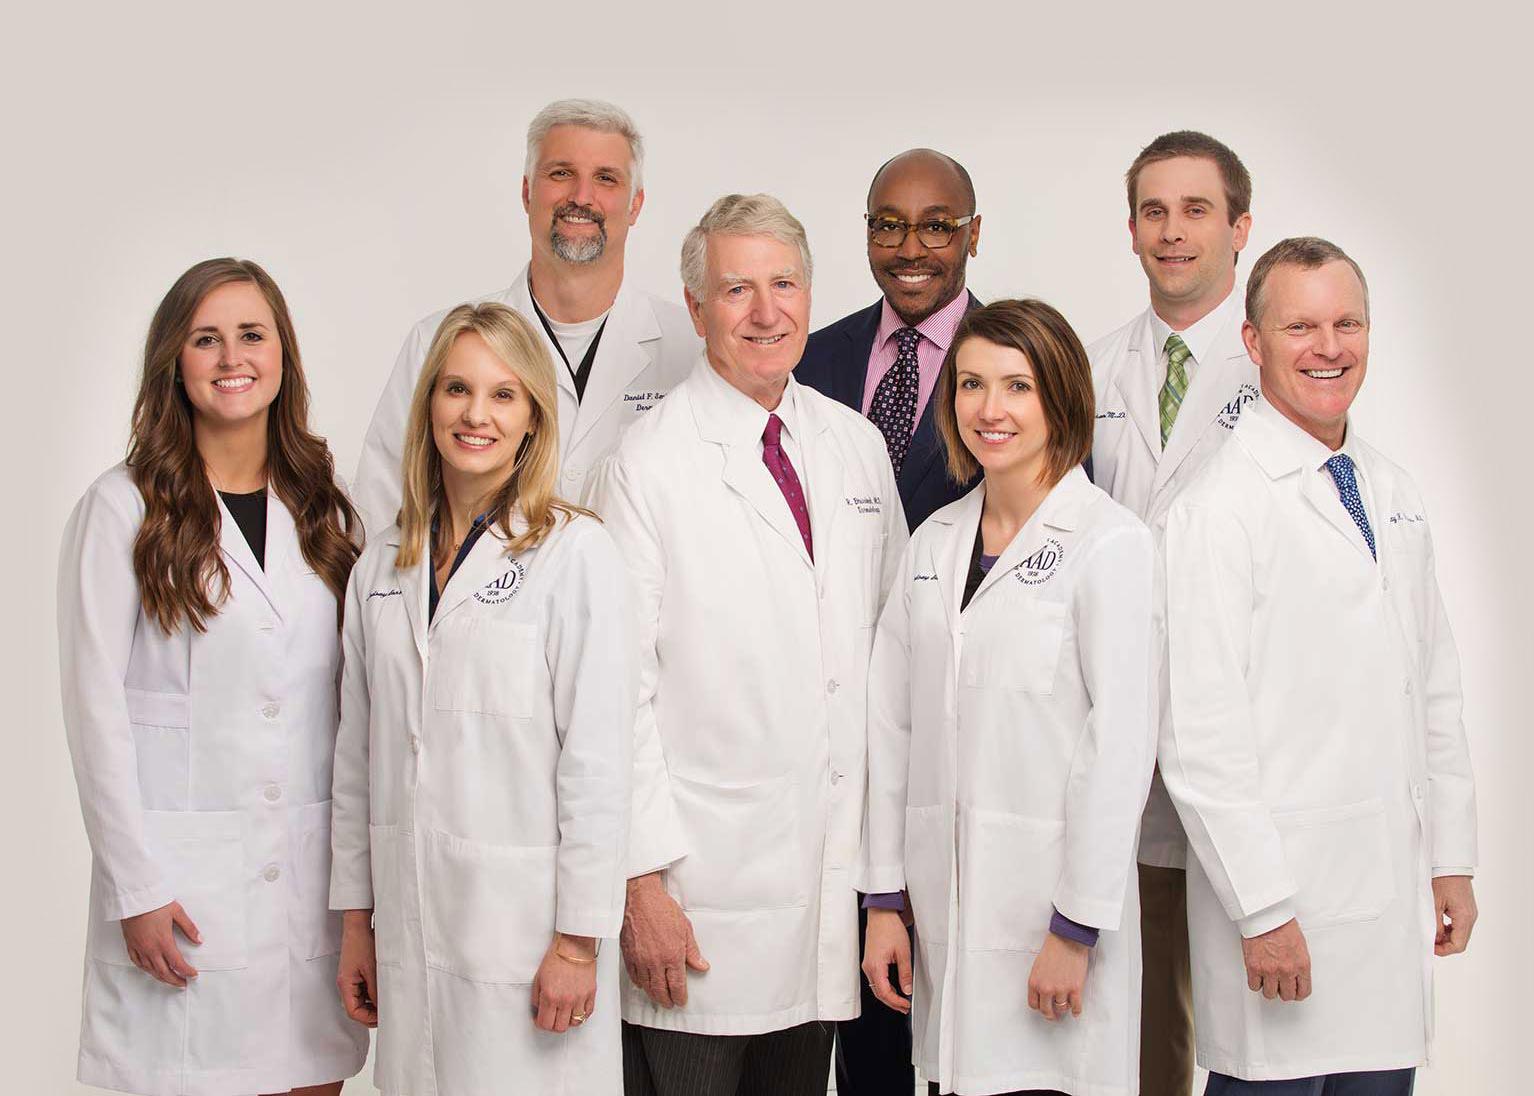 The Dermatology Group of Arkansas - Best Dermatologists in Arkansas